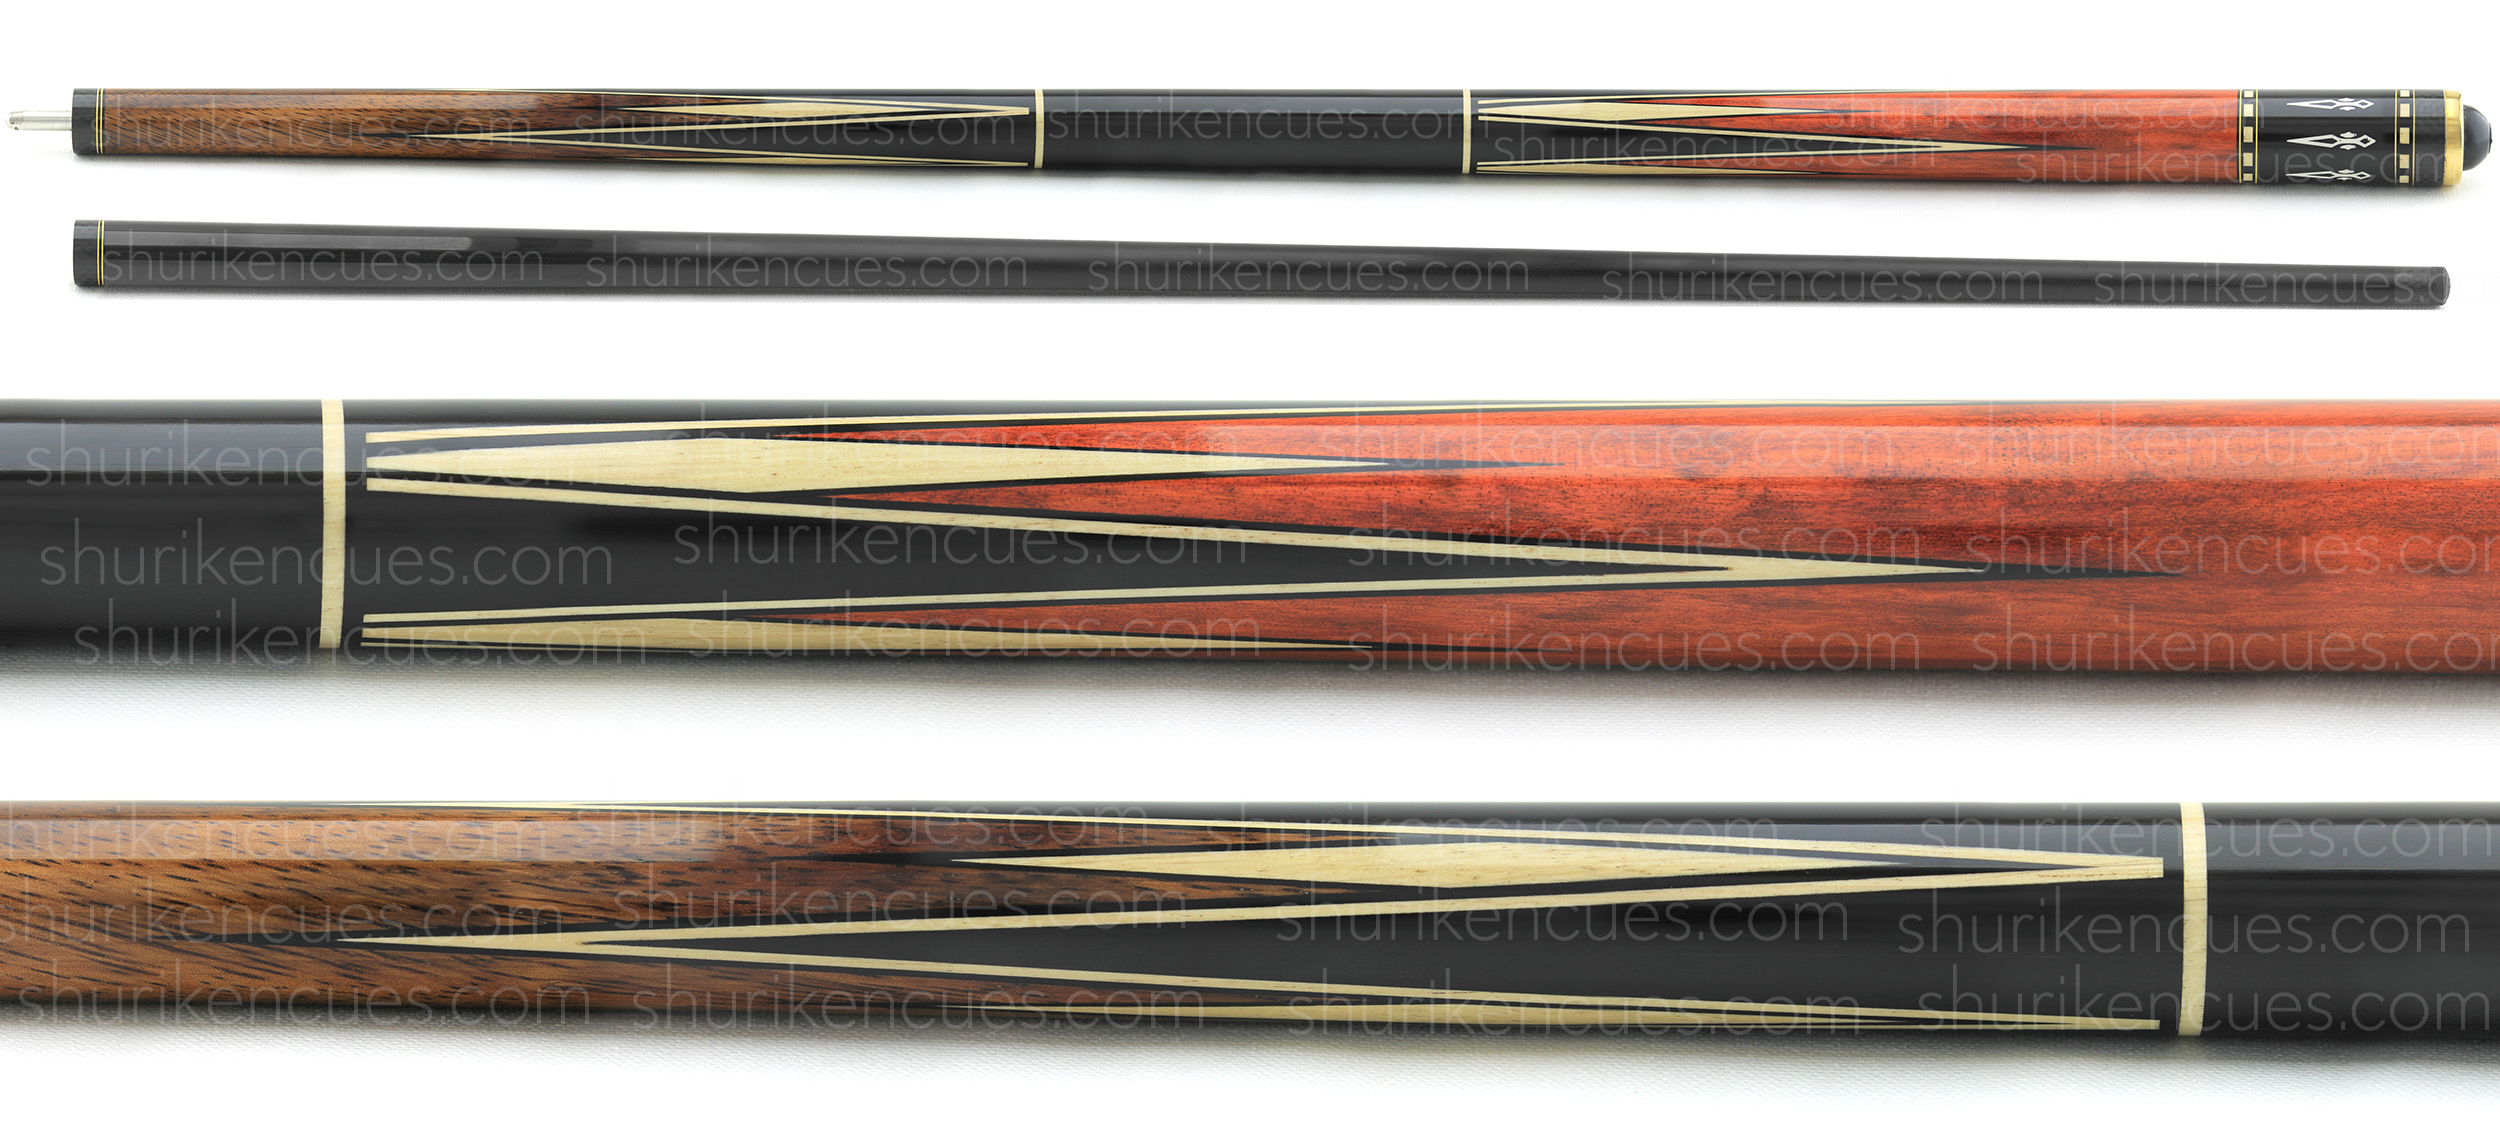 Crown-explosion-4x4p-title-big-1 chechen wood palisander crown